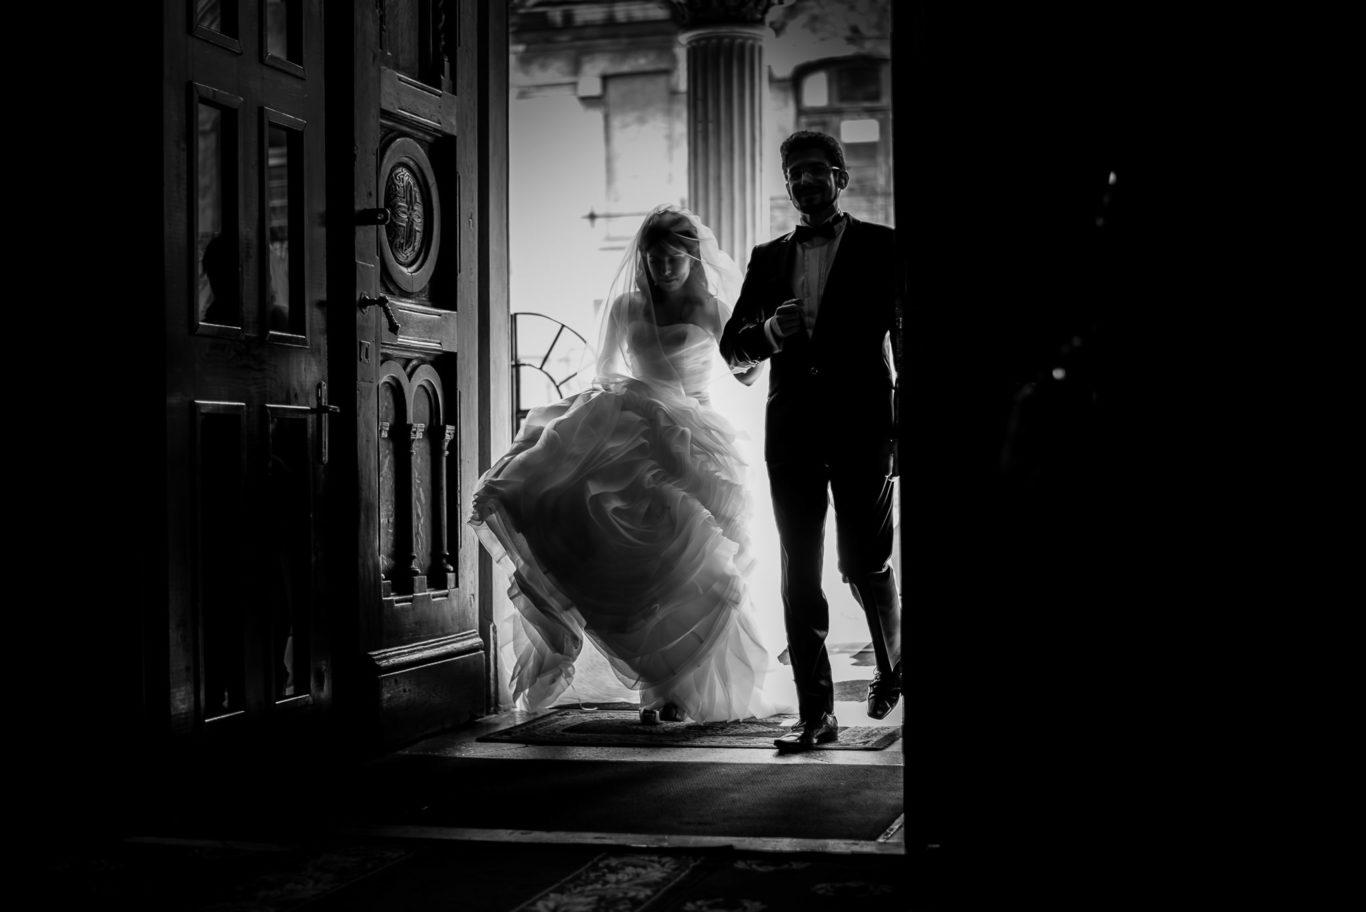 0399-Fotografie-nunta-Simona-Valentin-fotograf-Ciprian-Dumitrescu-DSC_1472